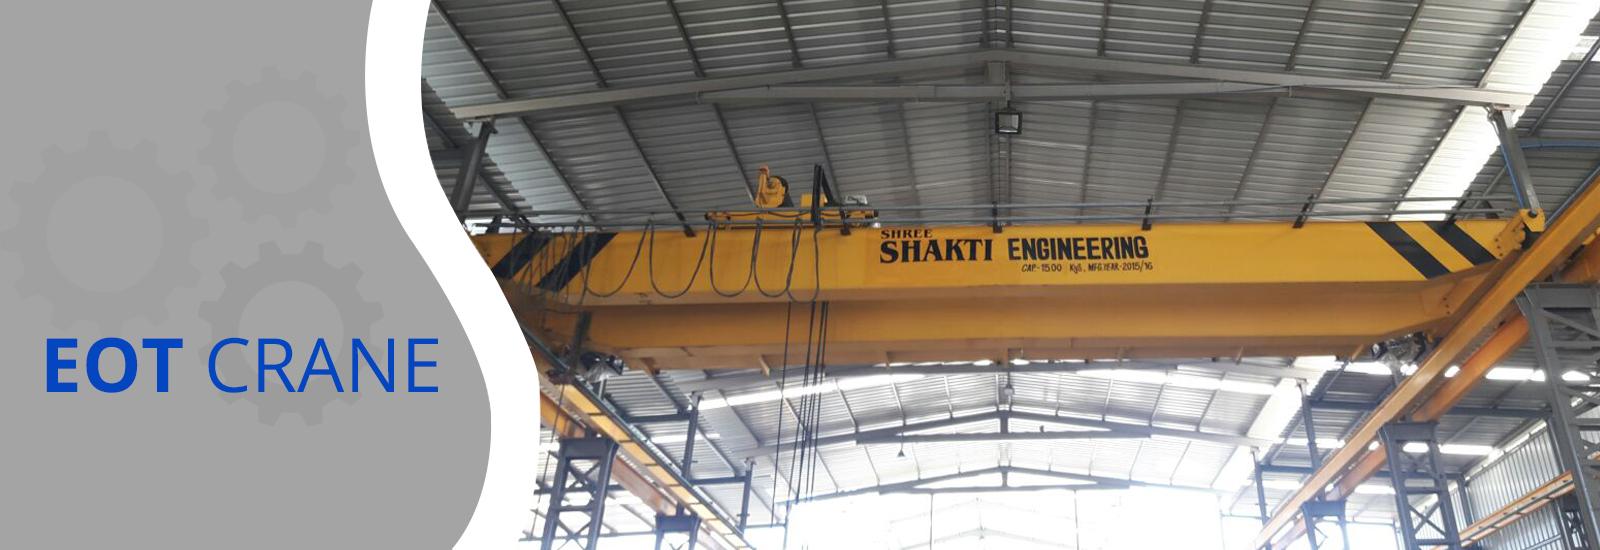 EOT-Crane-banner